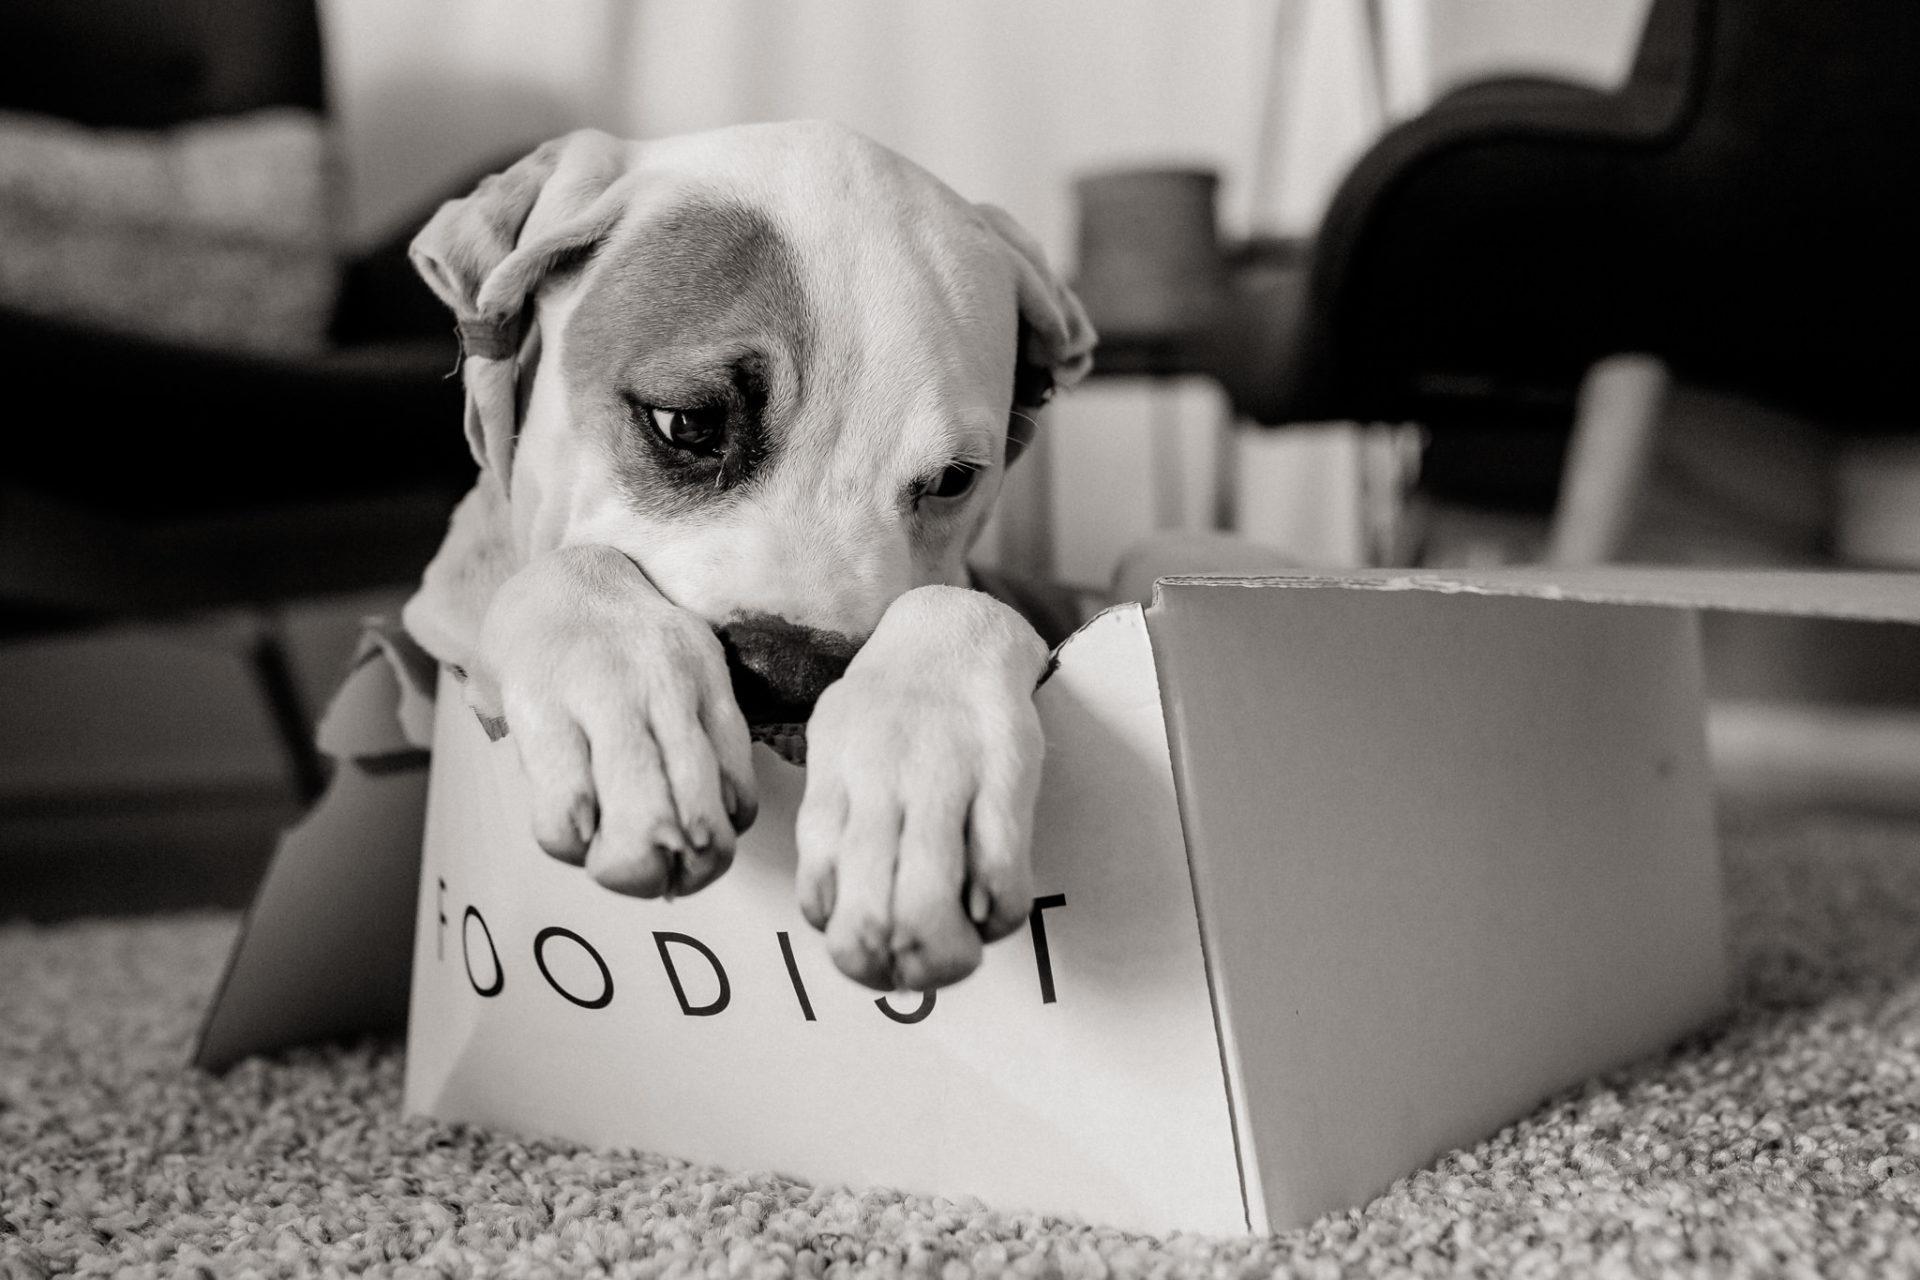 dog photographer stuttgart-pets portraits-natural animal photos-american bulldog puppy-foodist box